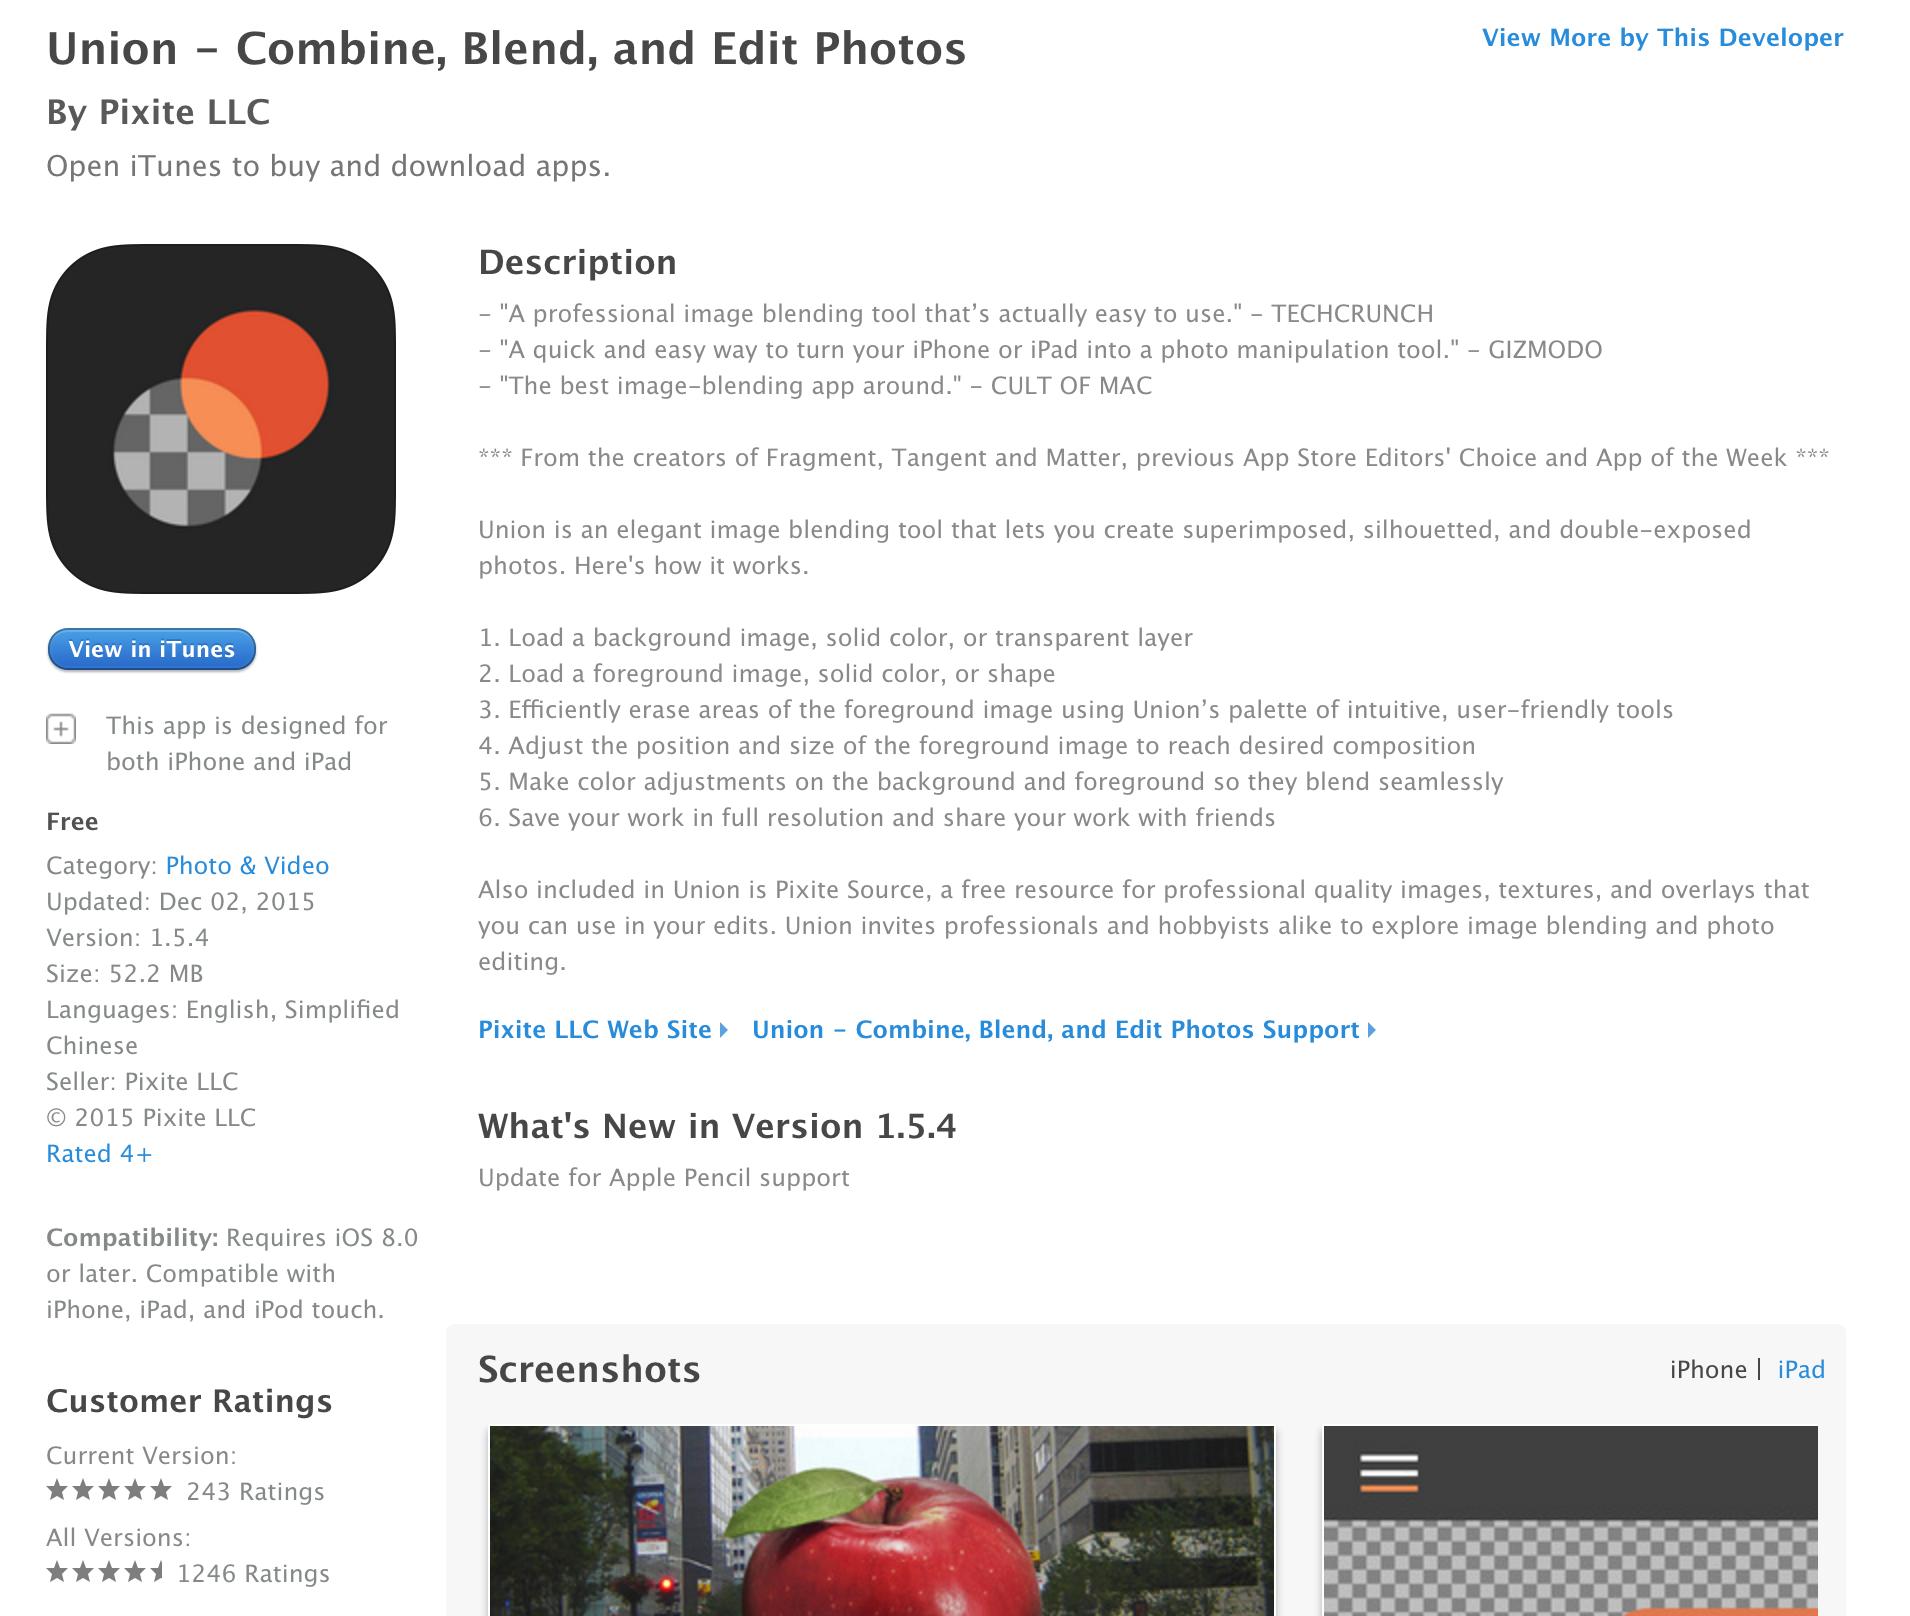 union-combine-blend-and-edit-photos-7